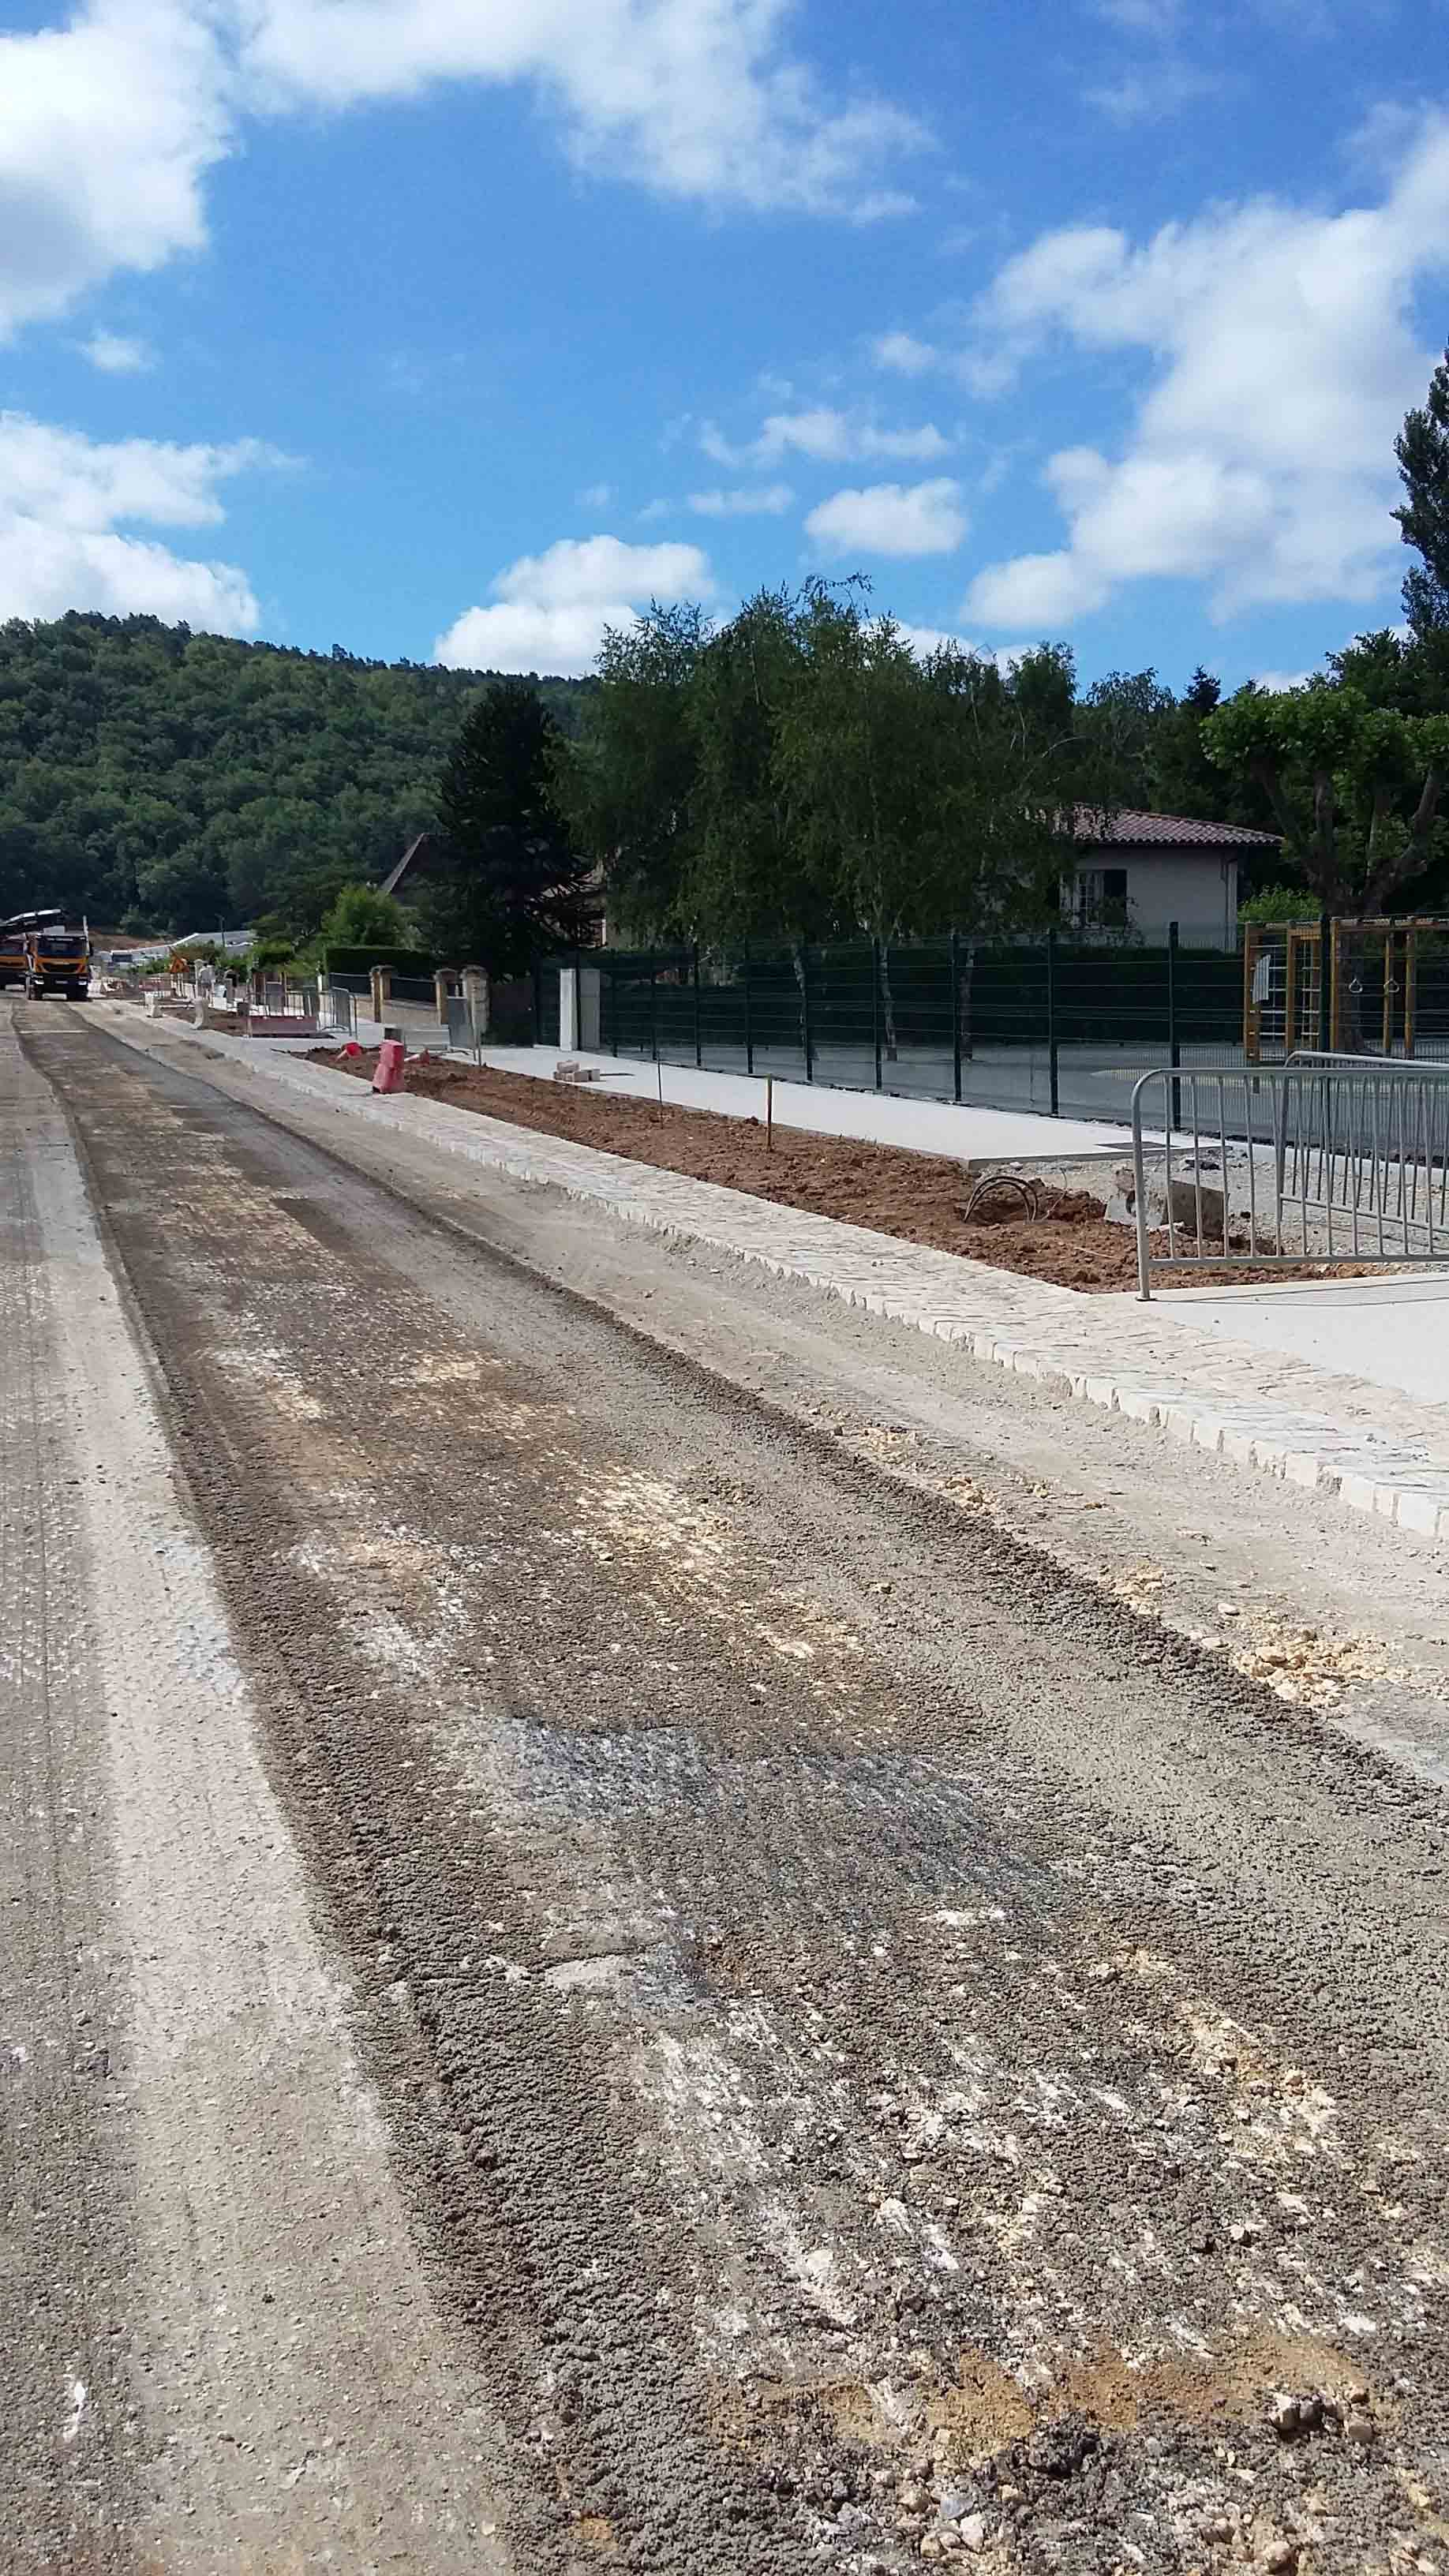 Aménagement urbain voiries Montignac 3